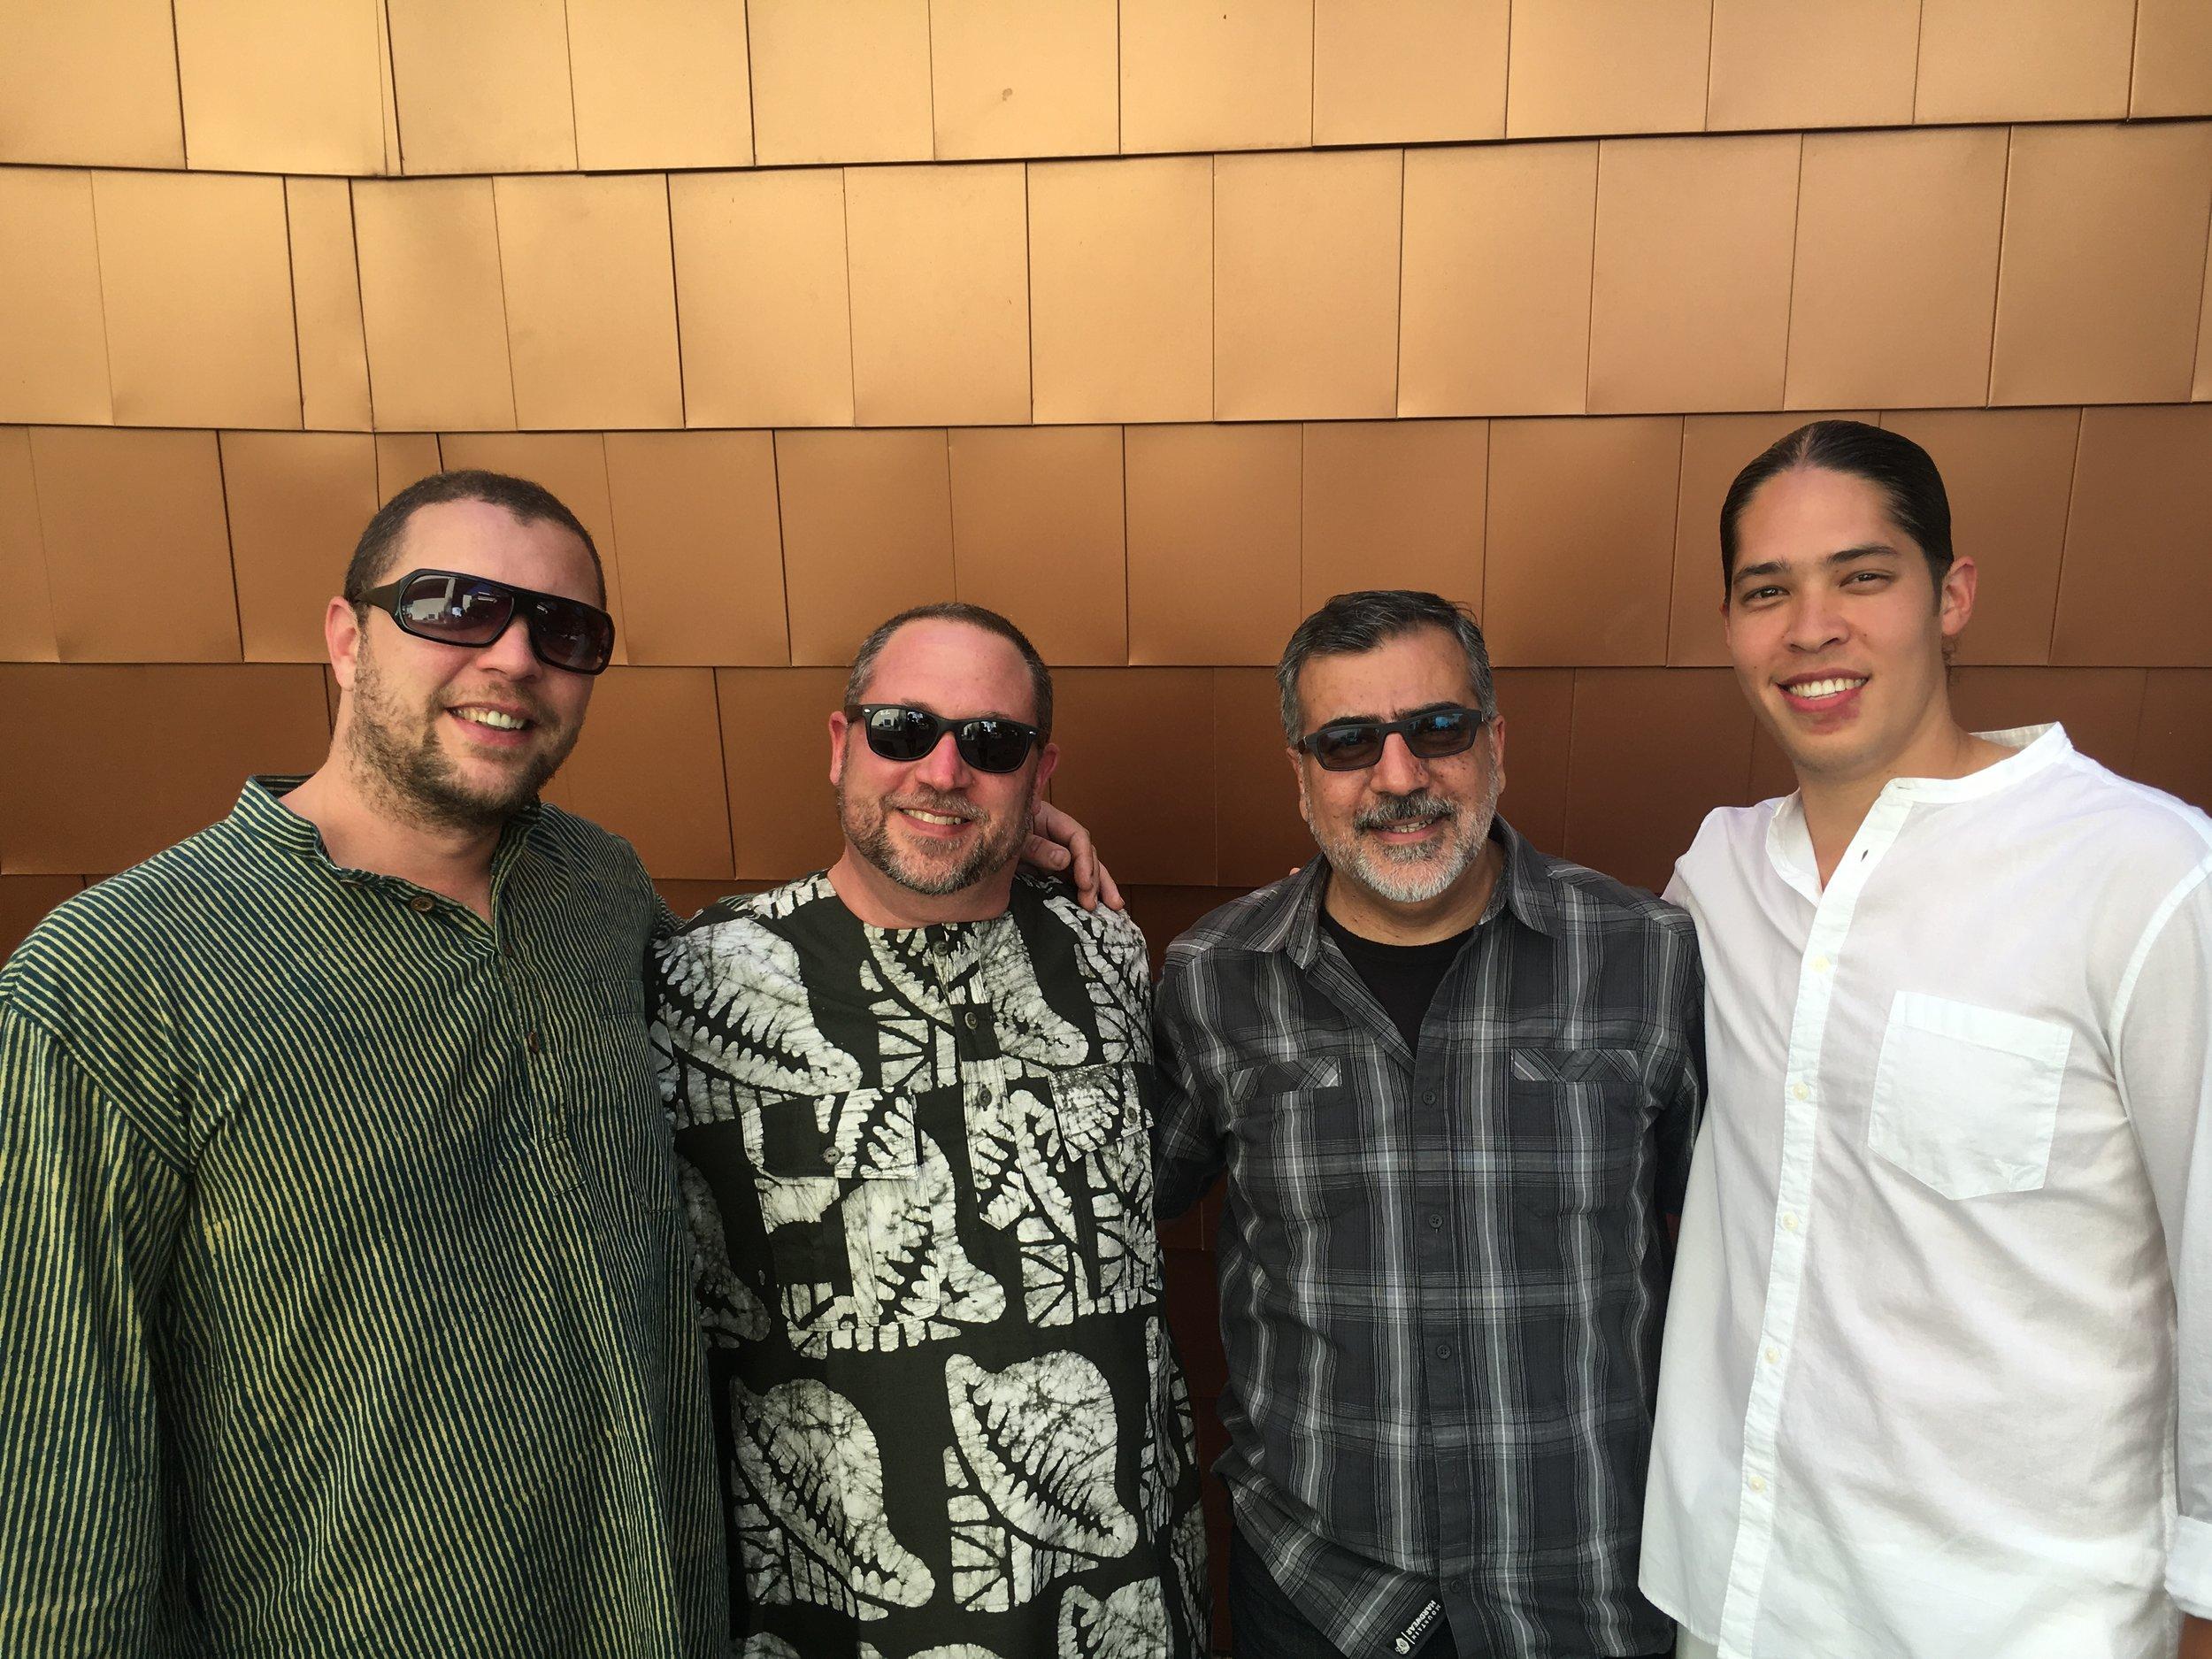 L-R: Andrew Grueschow, Randy Gloss, Houman Pourmehdi, Alex Shaw  CalArts World Music Festival 2017